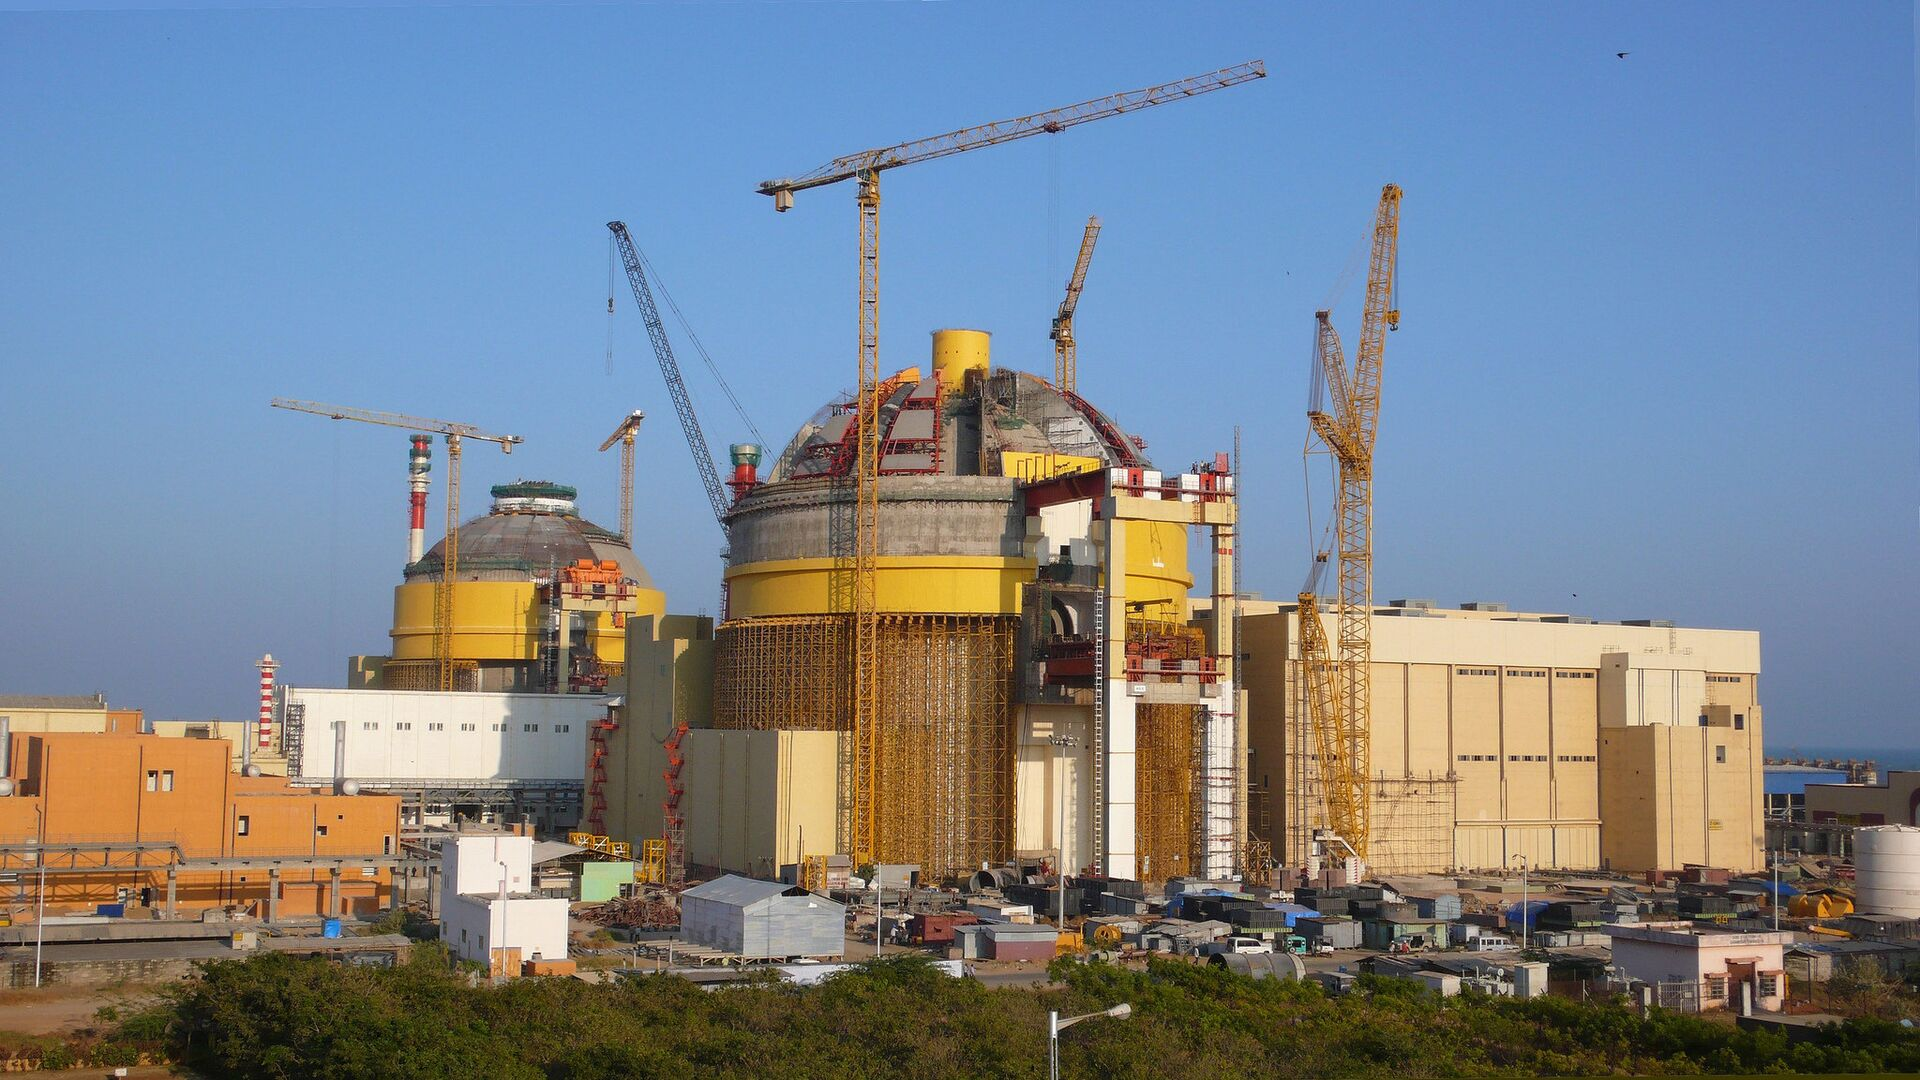 La planta nuclear india de Kudankulam - Sputnik Mundo, 1920, 29.06.2021